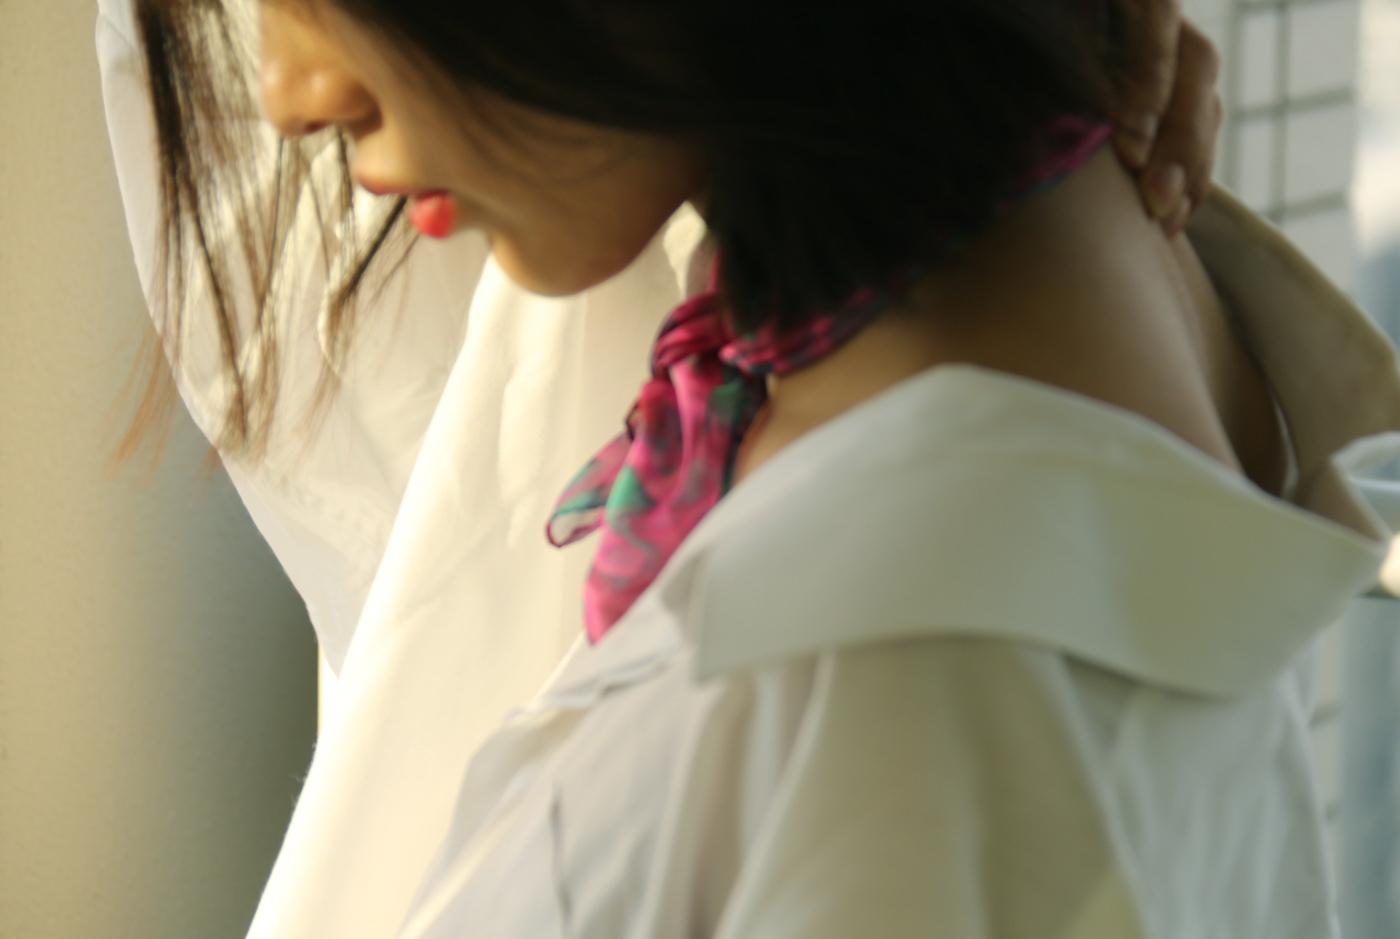 buy pink fashion silk scarf online in paris taipei tokyo スカーフコーデ by bambi watanabe 渡辺万美; isetan selfridges barneys new york